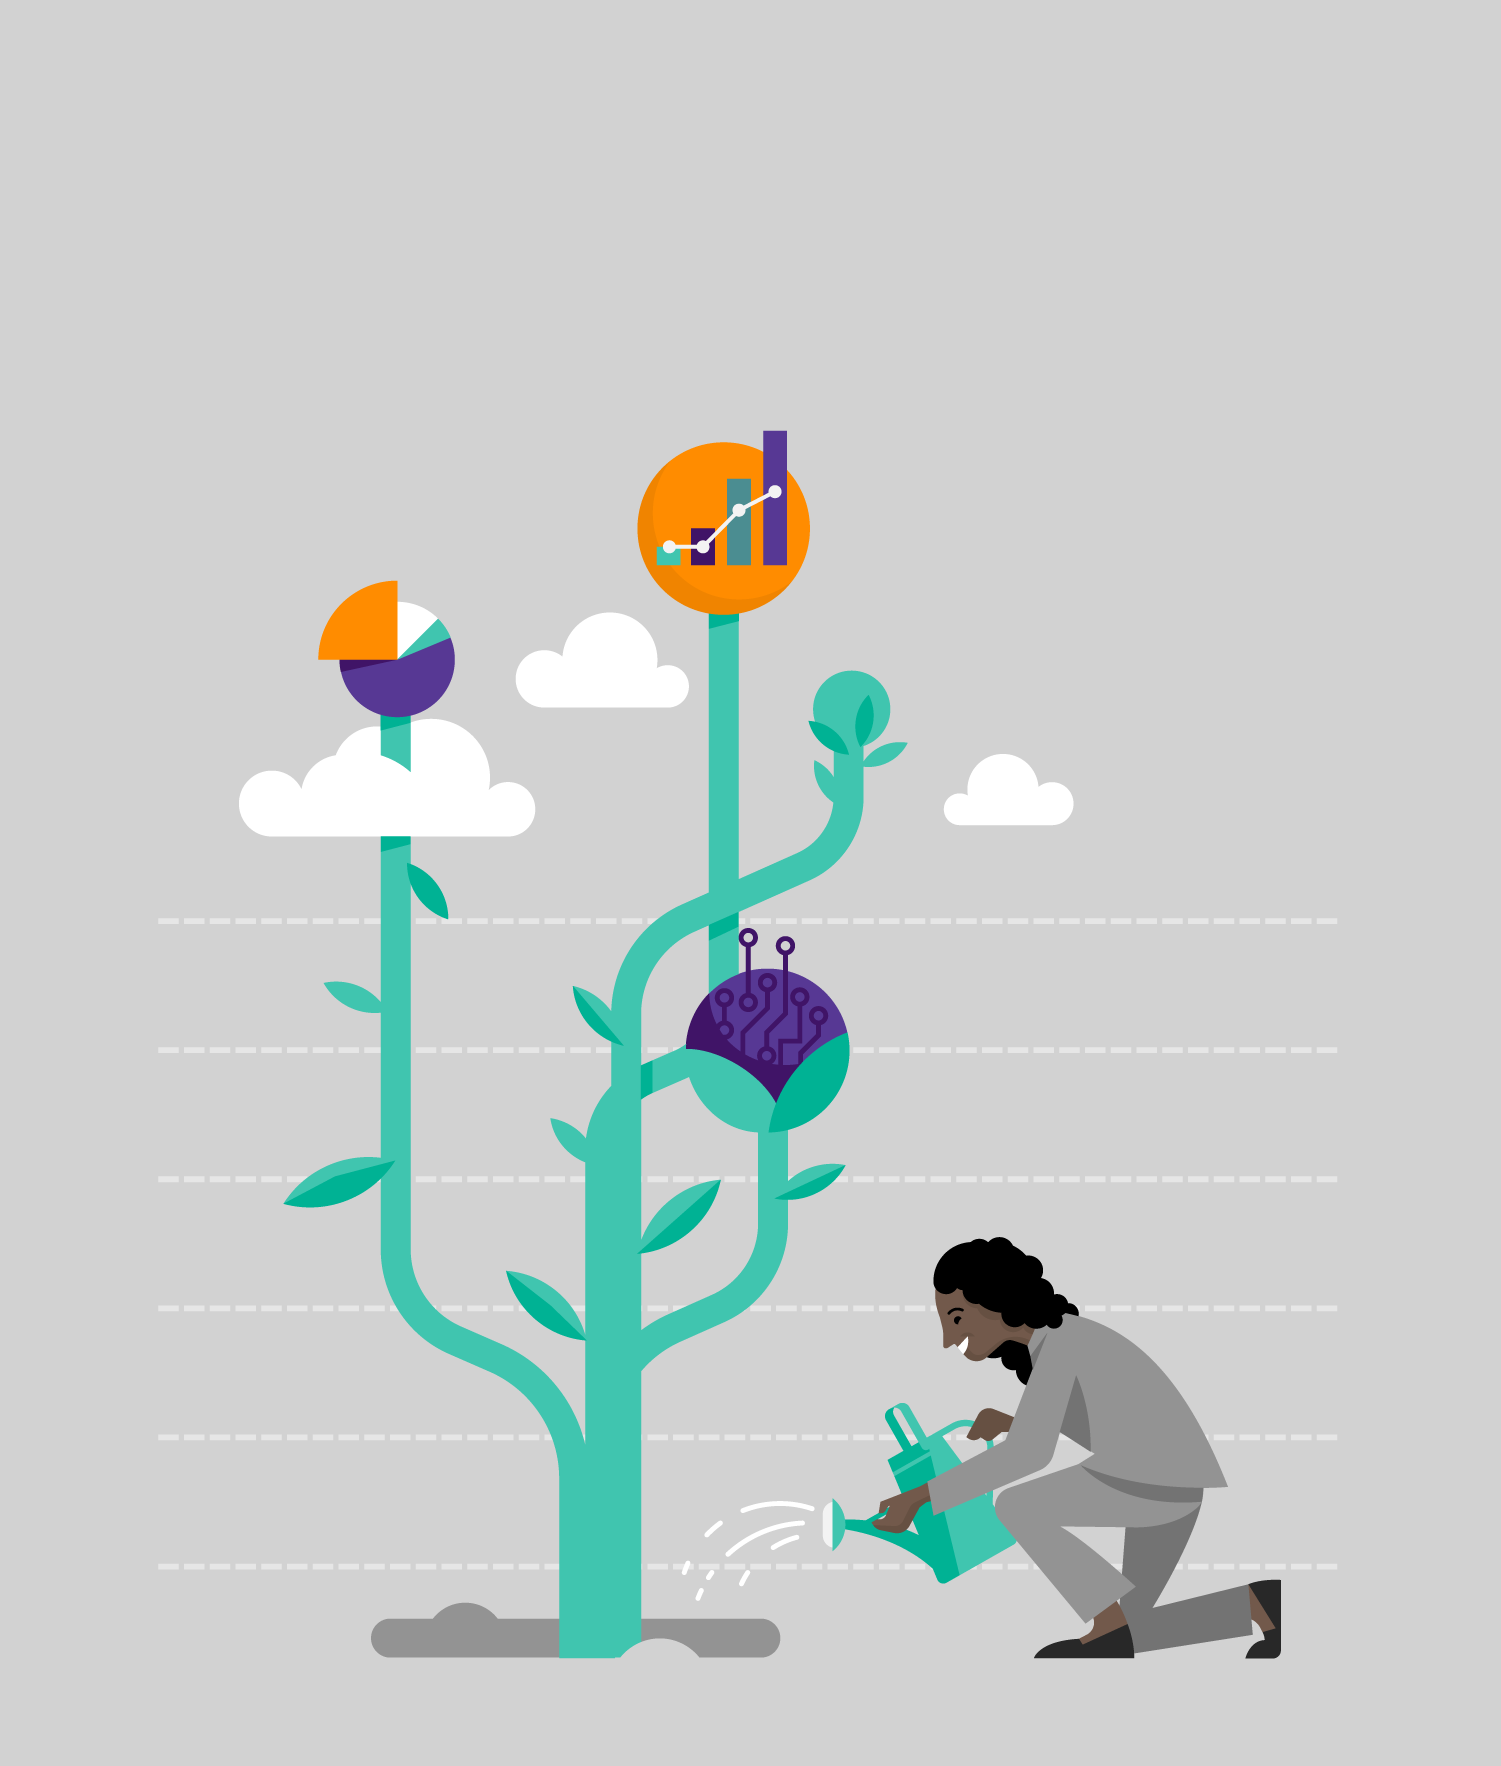 Microsoft_DannySchlitz_New_Illustration_growing.png